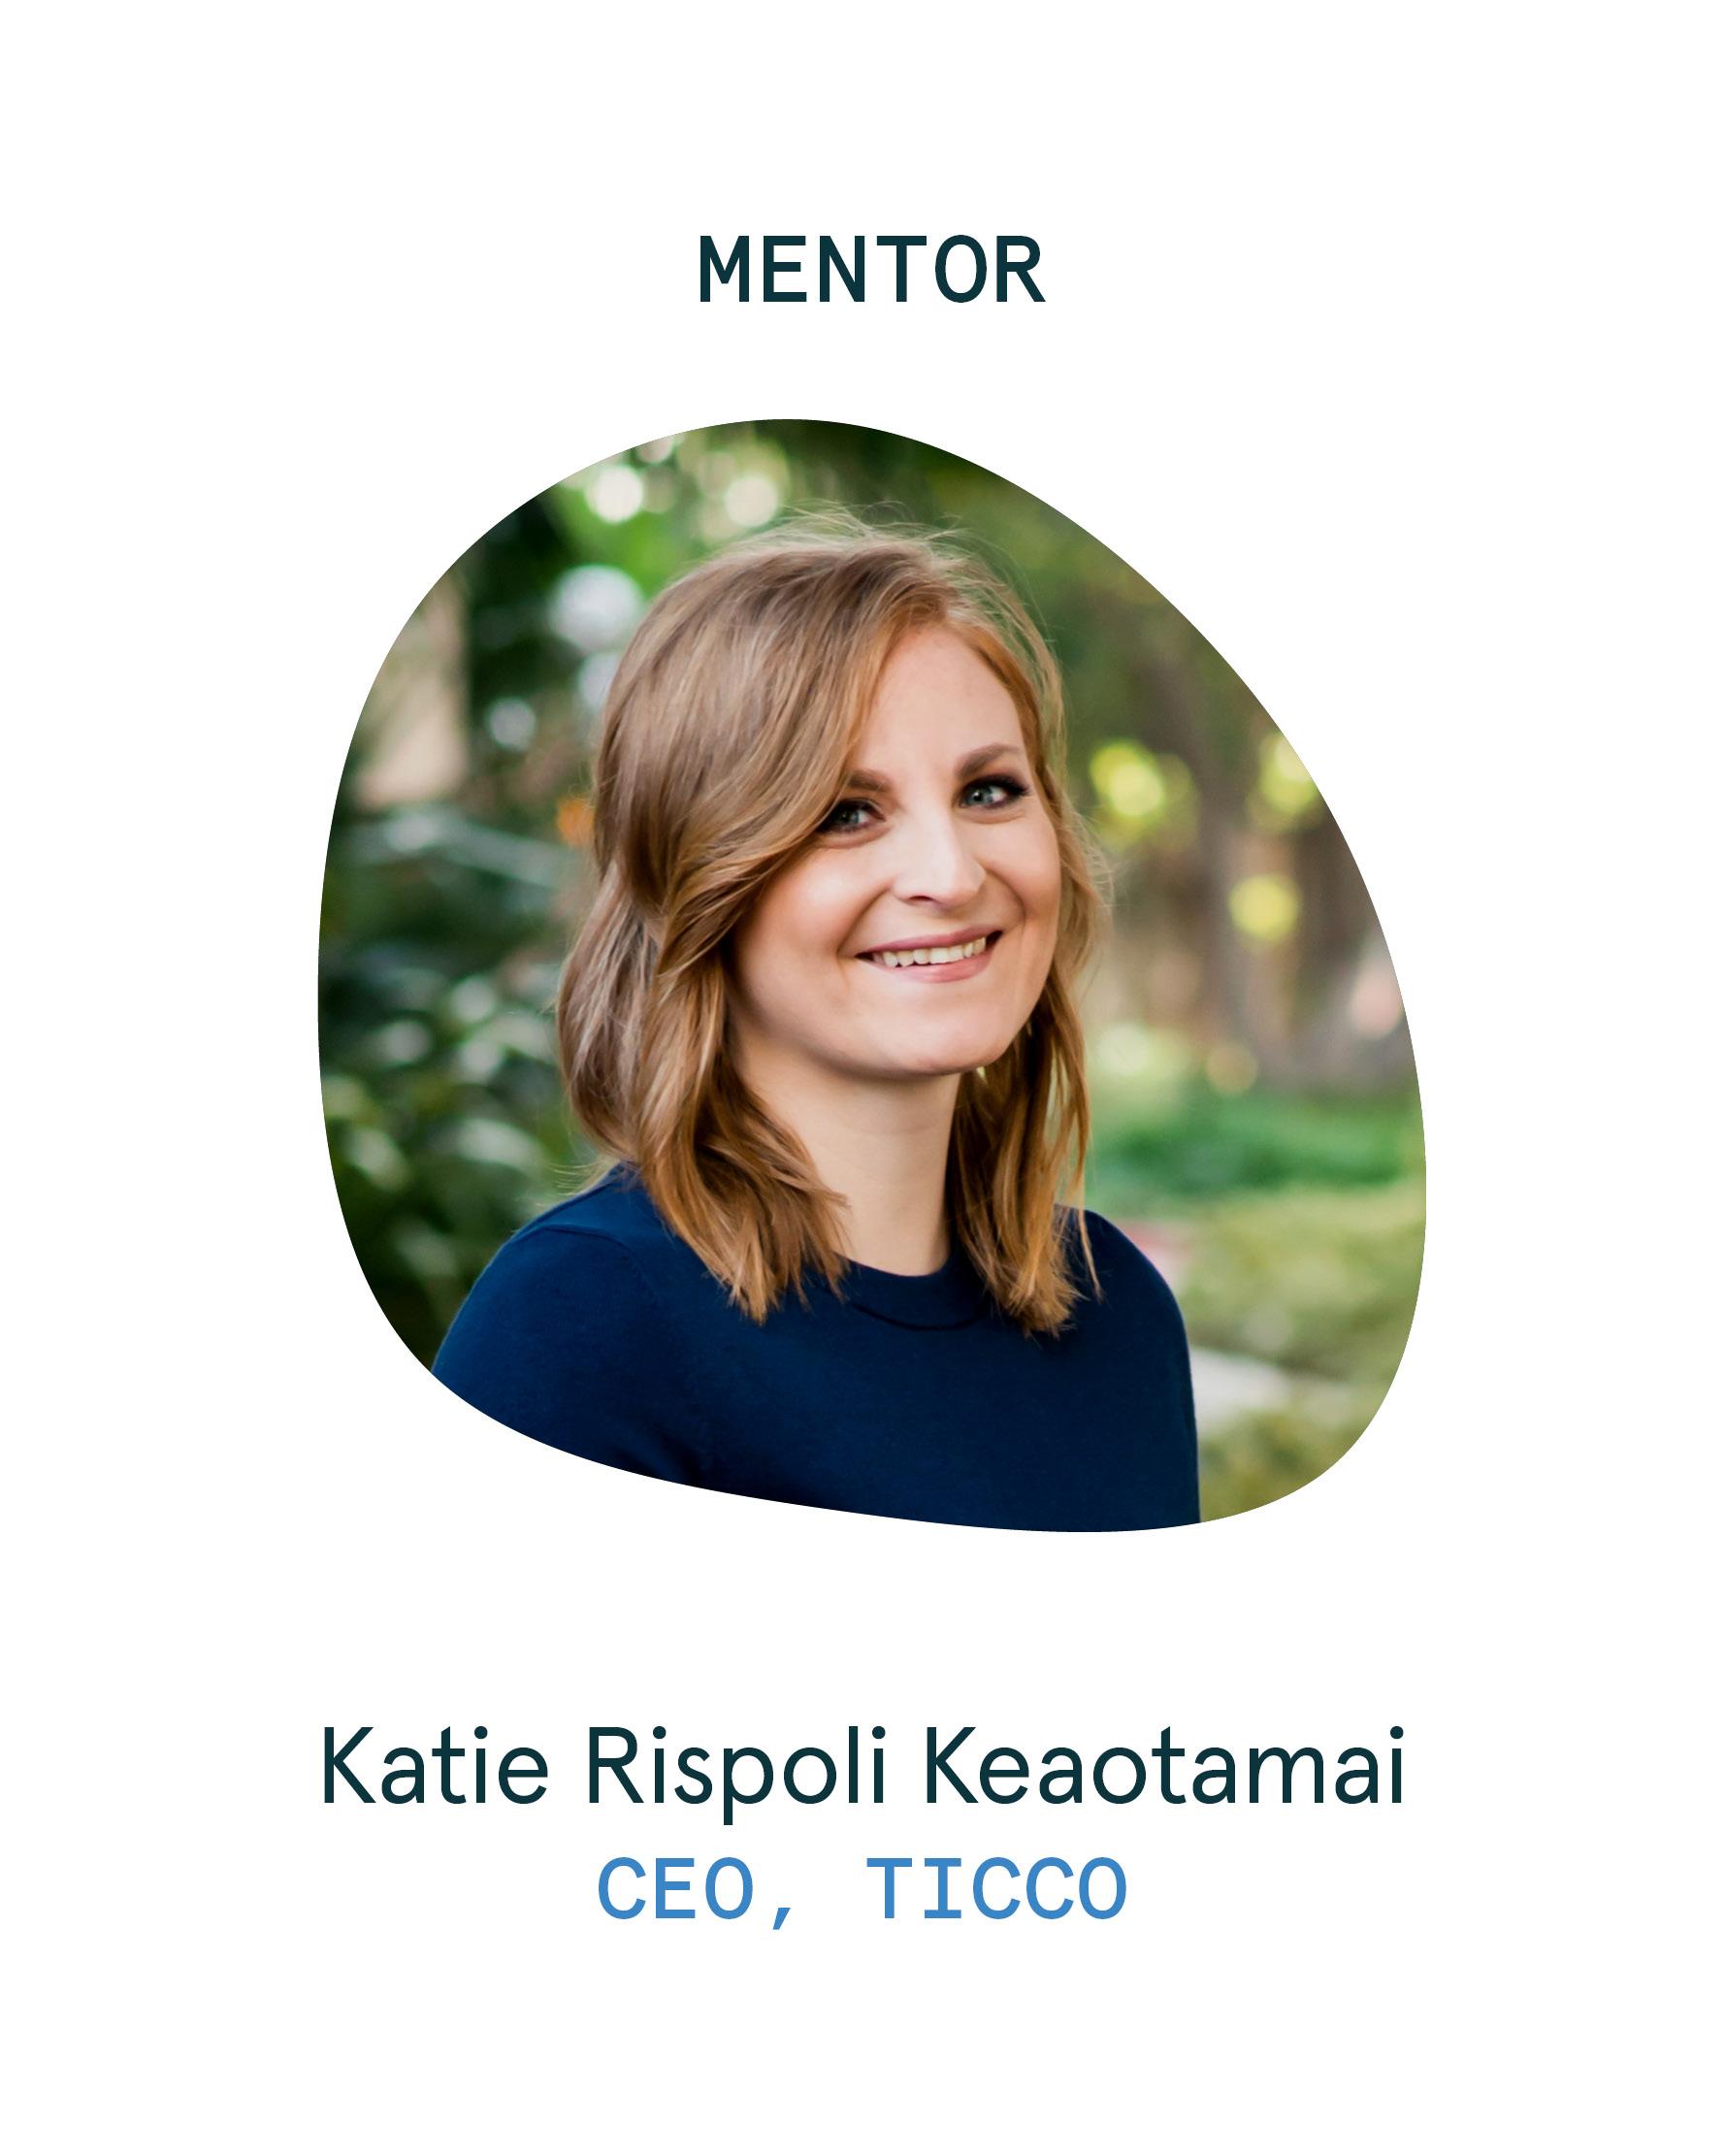 Mentor_Katie Rispoli Keaotamai